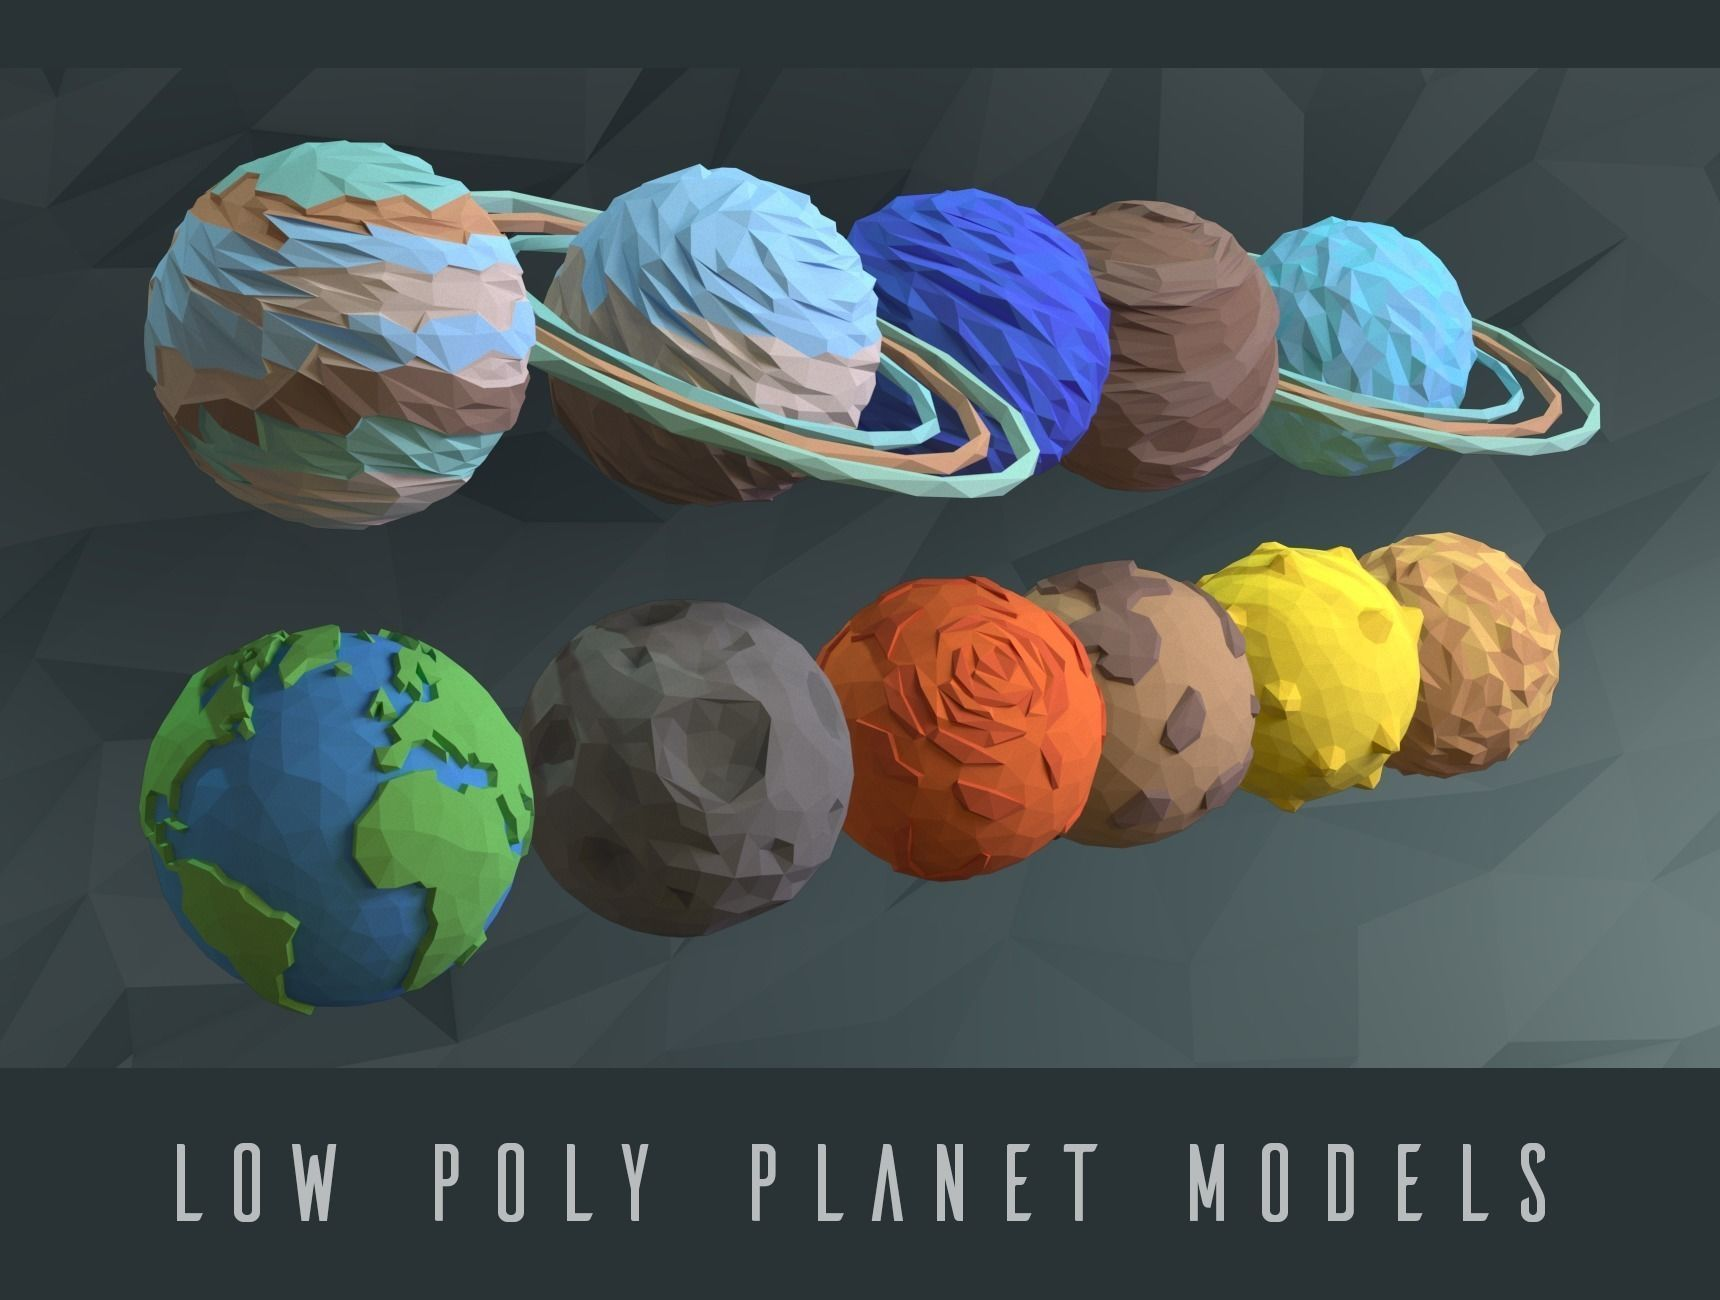 low poly planets 3d model low-poly max obj 3ds fbx stl mtl 1